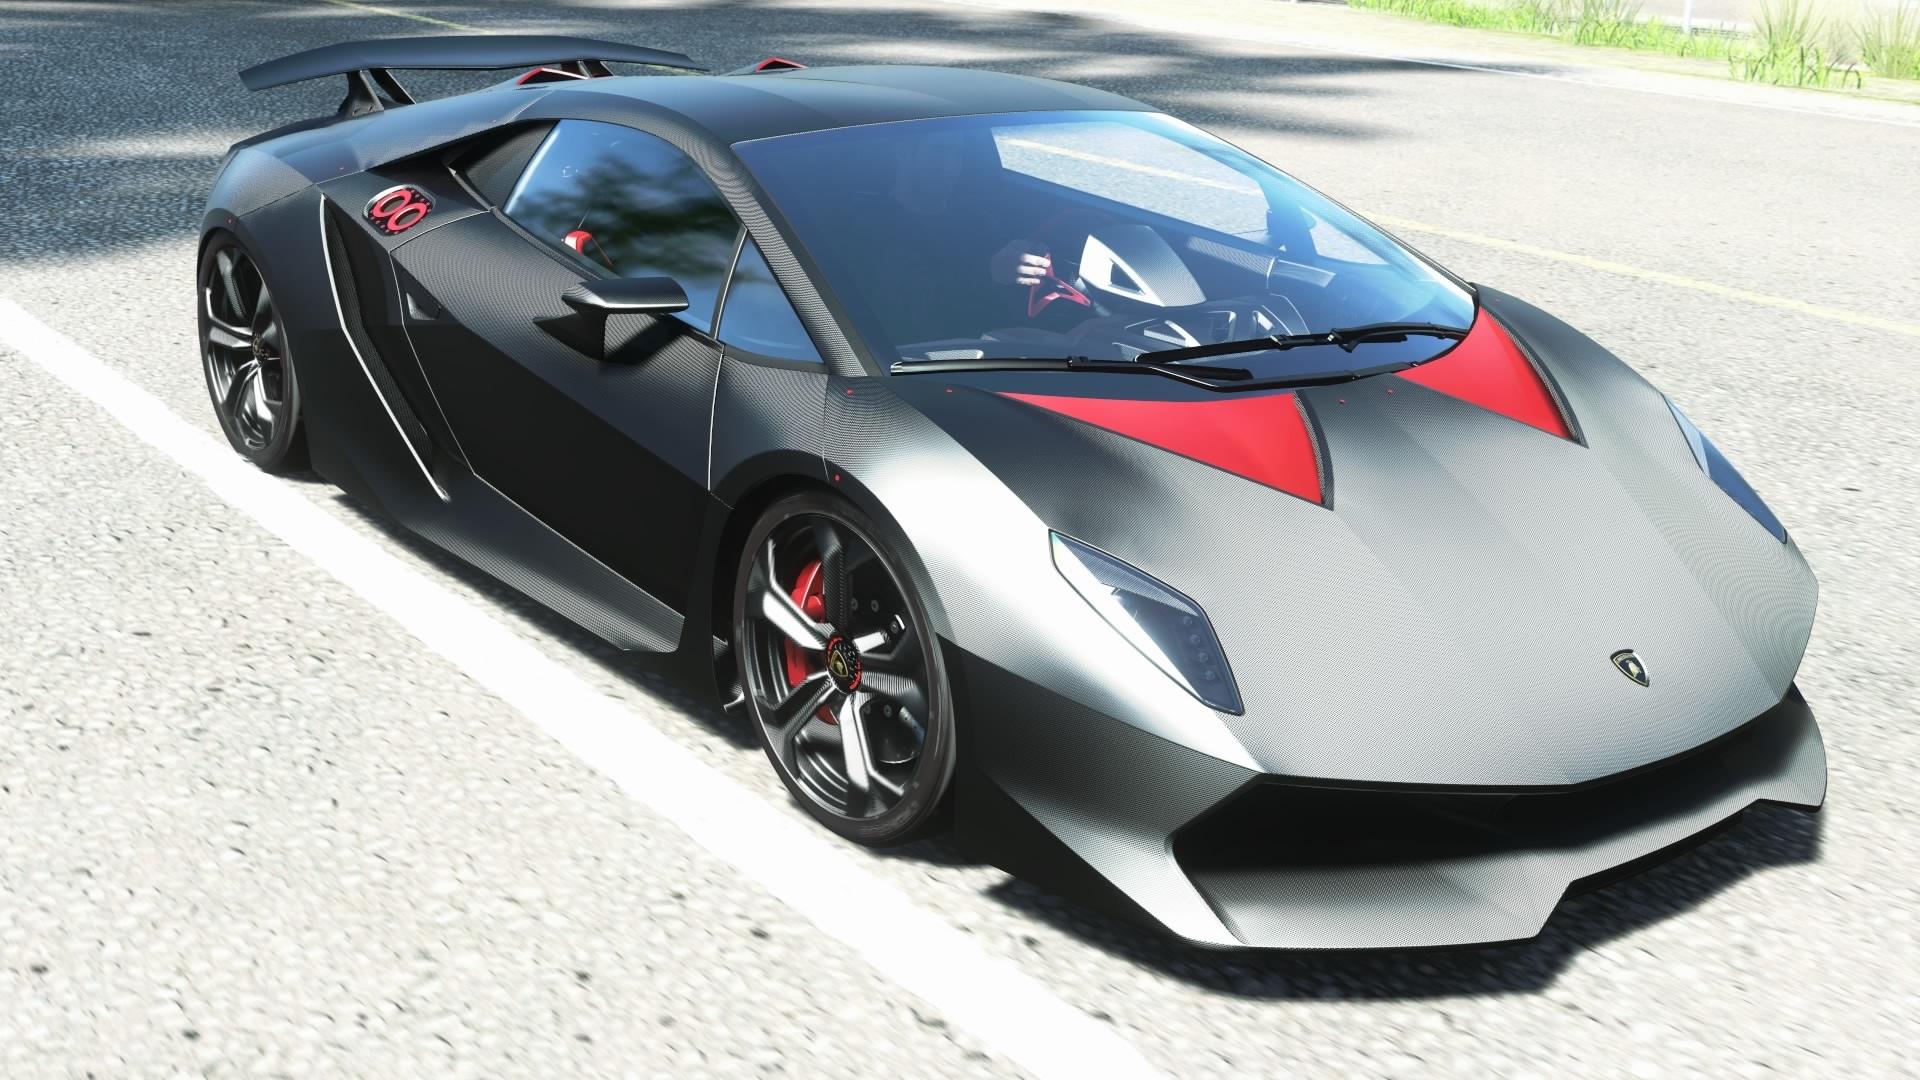 Luxury Sports Car, Auto, Automobile, Car, Lamborghini, HQ Photo